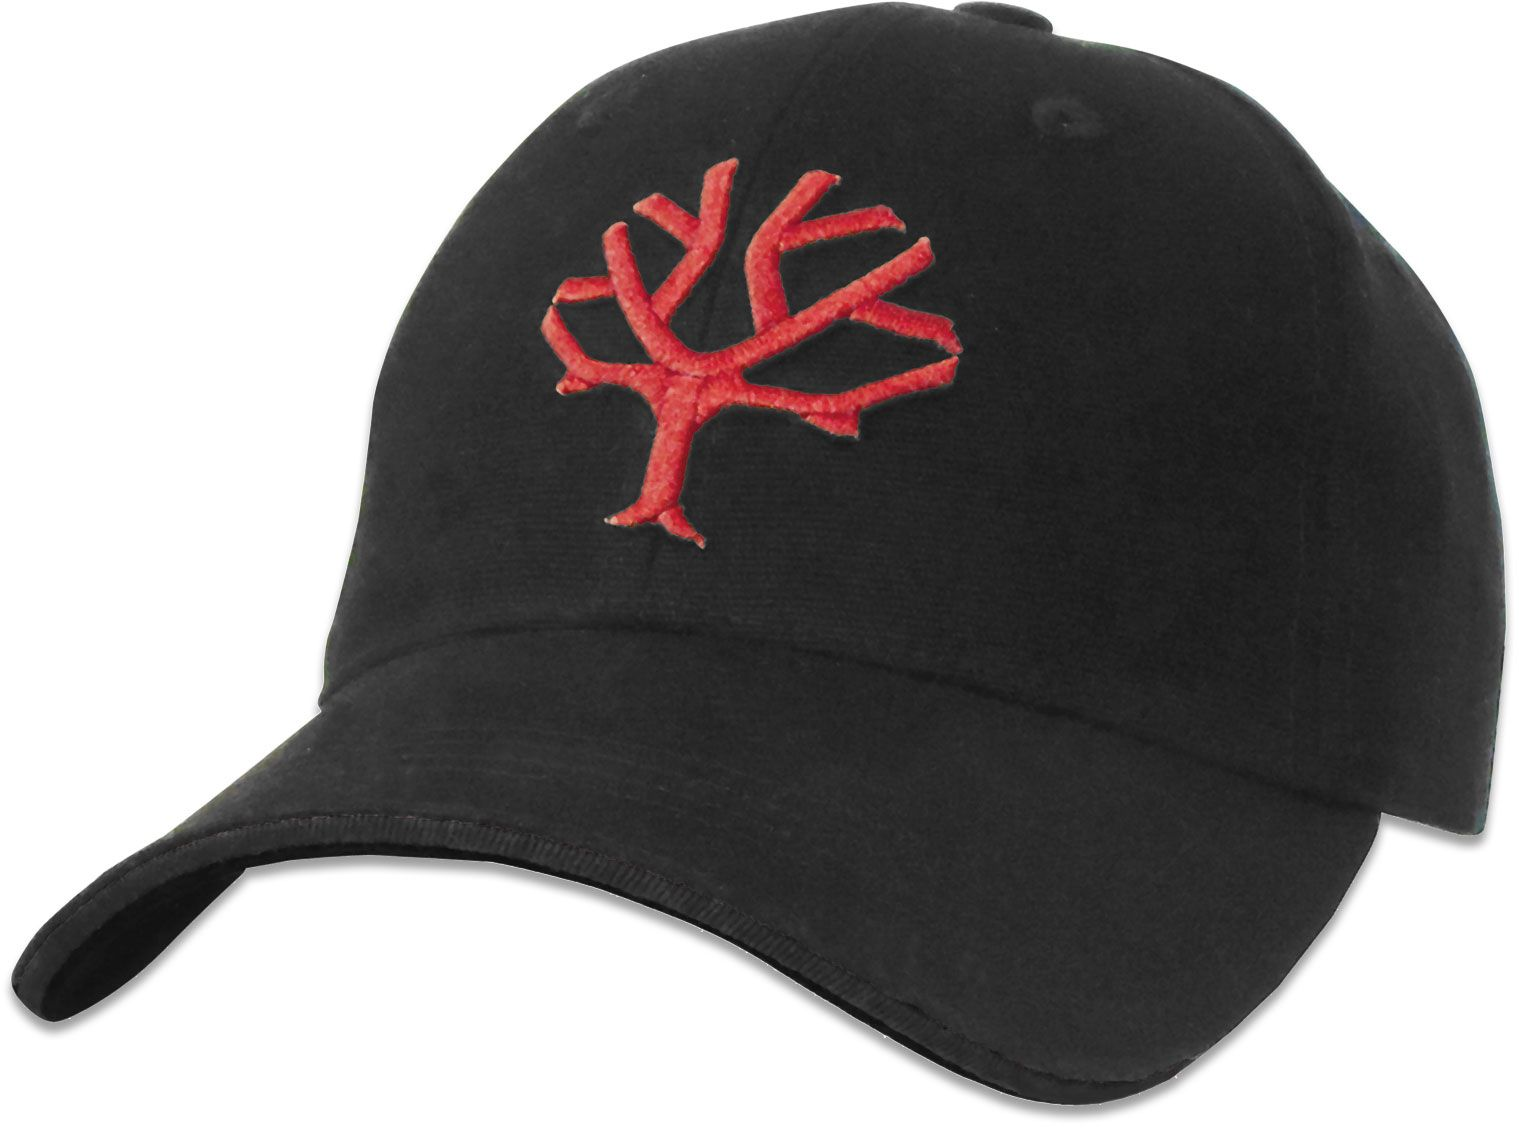 Boker Velcro Cap, Black with Red Tree Brand Logo